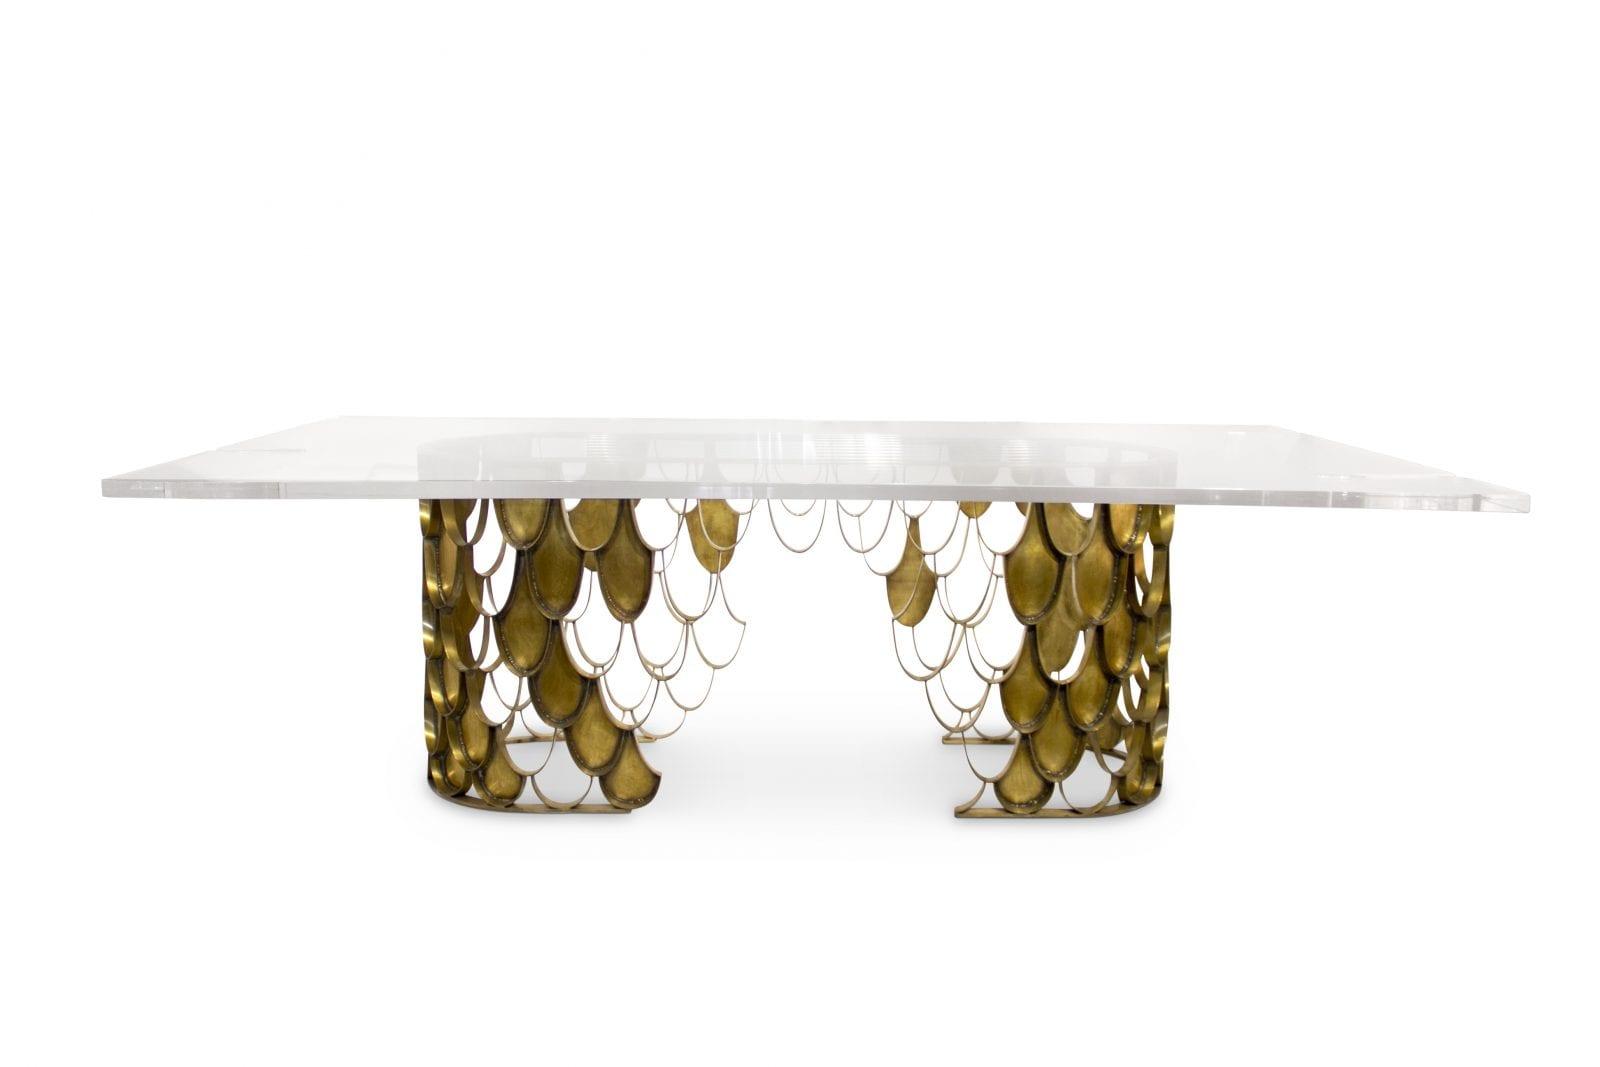 2 Brabbu Koi Dining Table - Trendurile în decorațiuni pentru 2019: Primele impresii